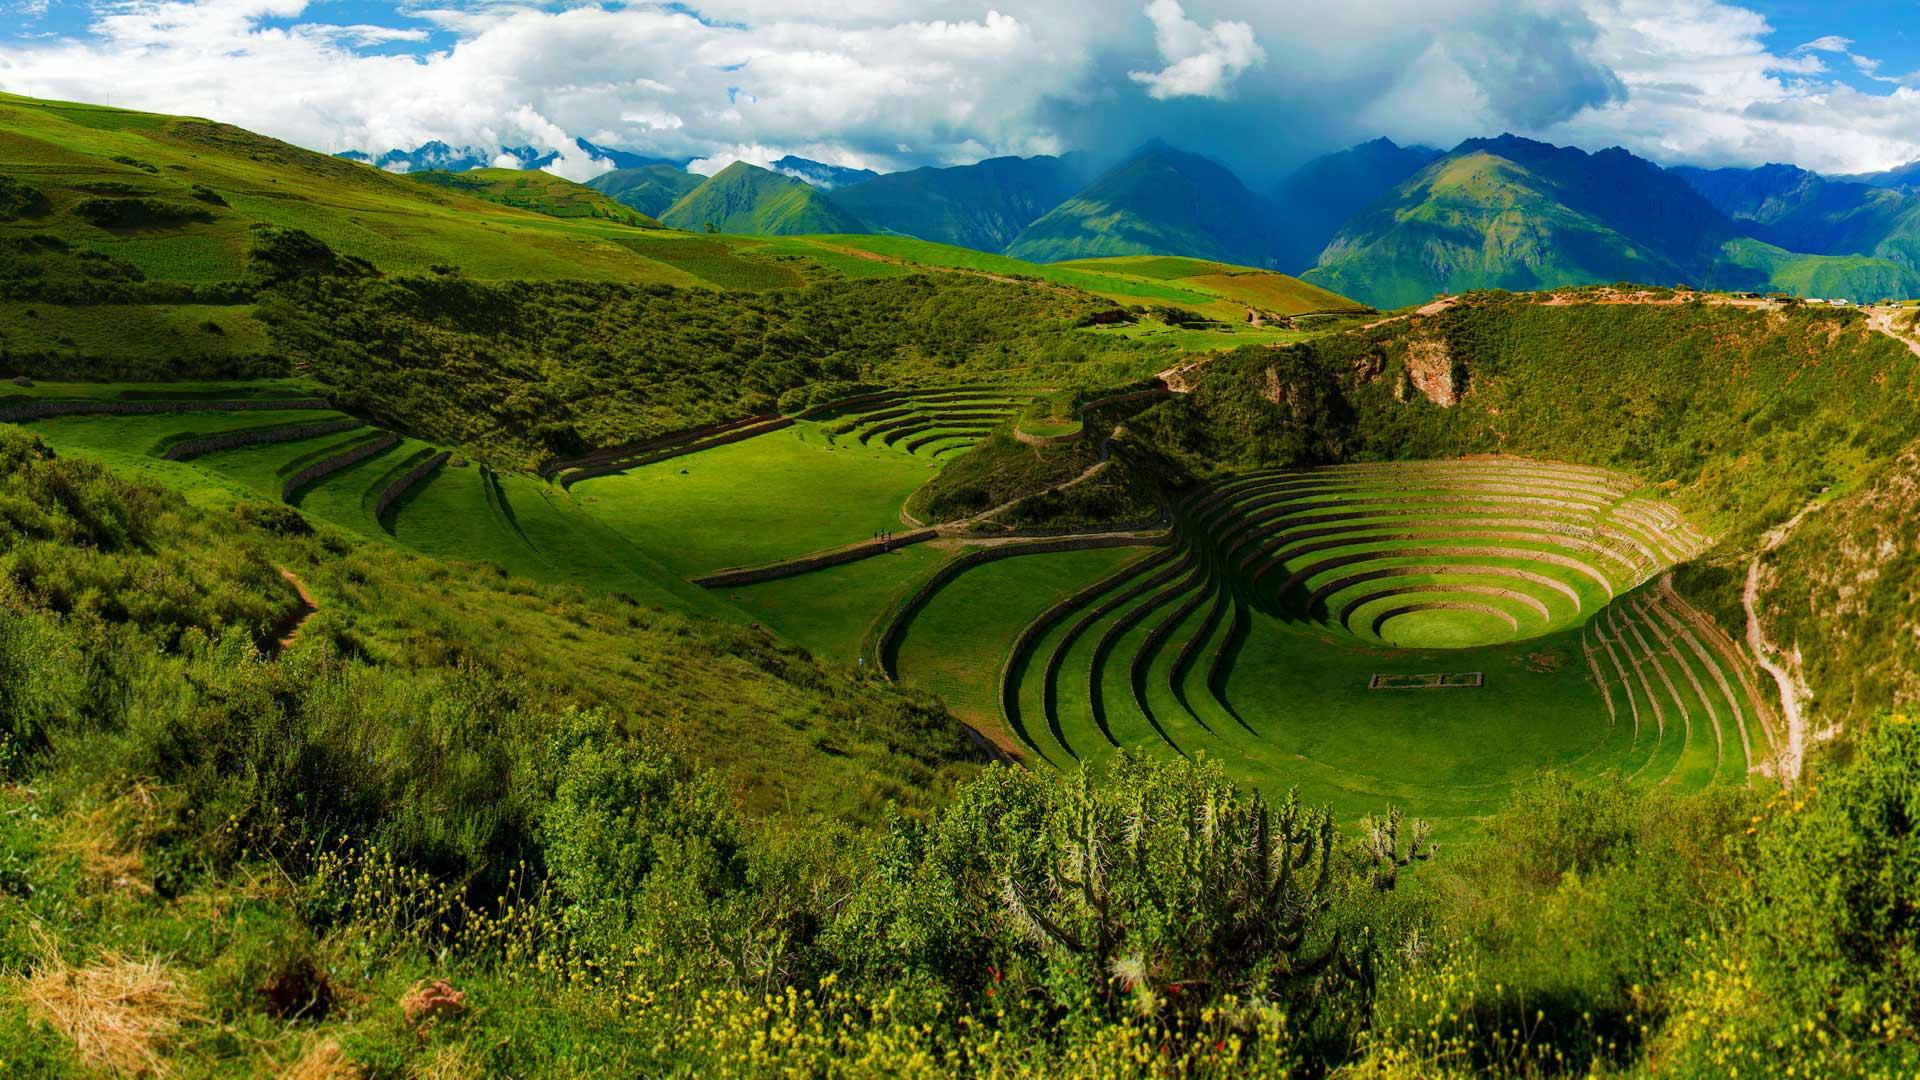 Circular Inca Terraces